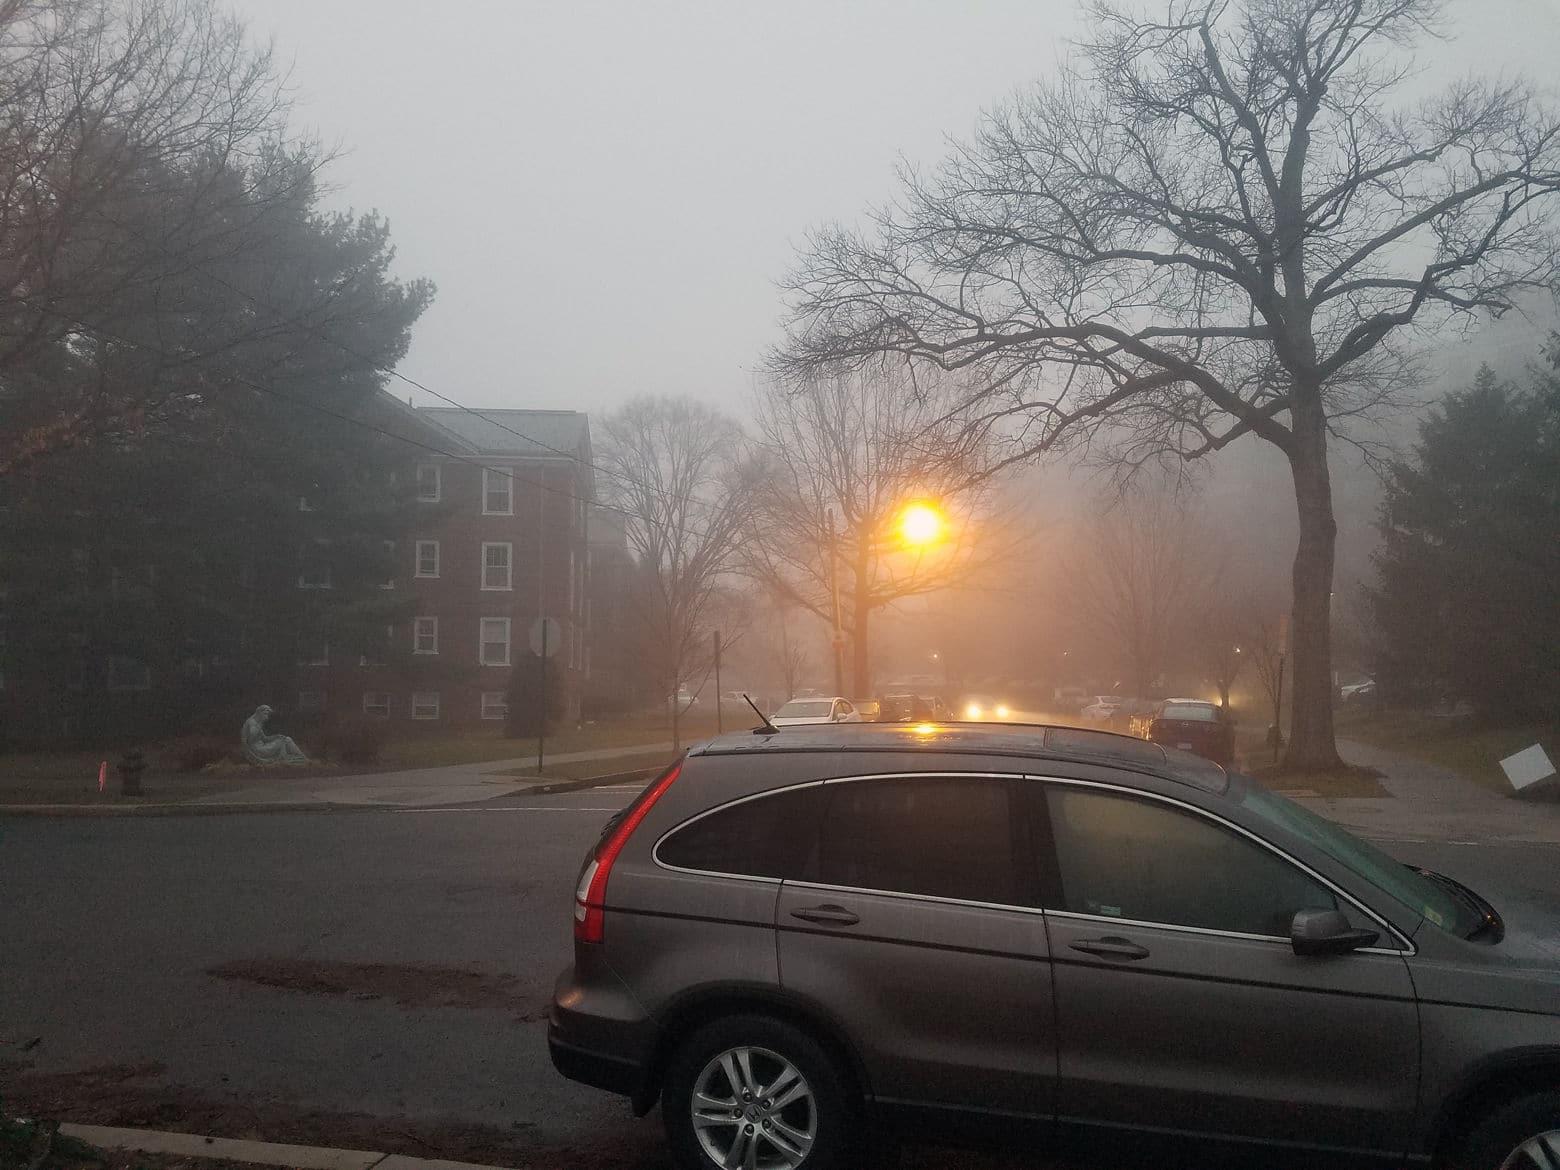 Dense fog covered the Washington area early Saturday morning. (WTOP/Will Vitka)